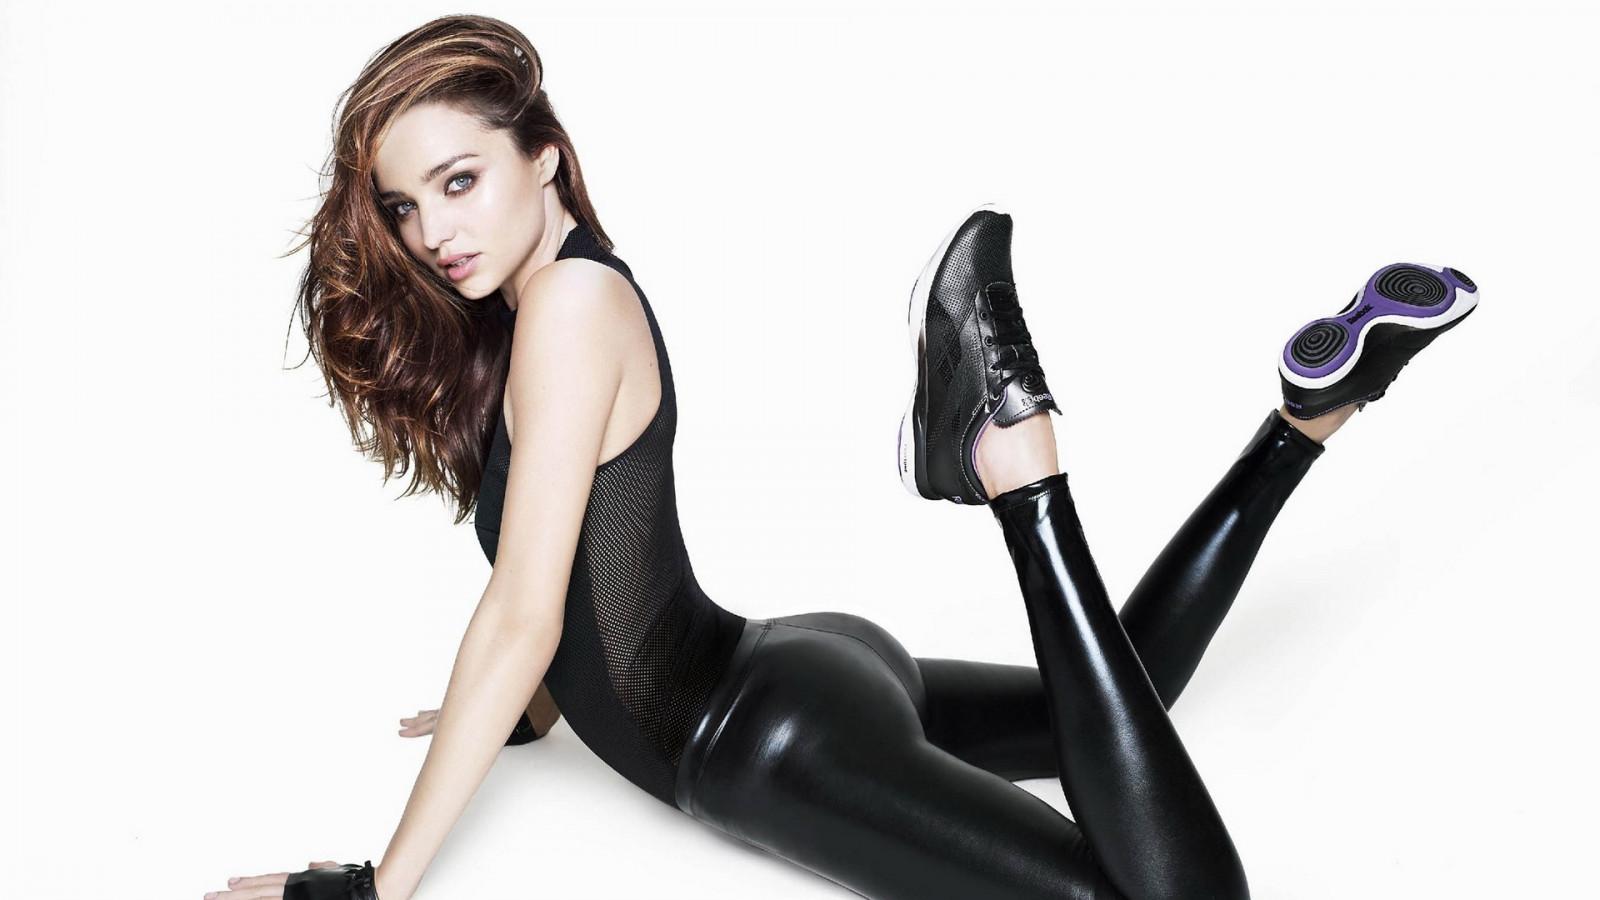 https://c.wallhere.com/photos/98/88/Miranda_Kerr_model_women_leather_leather_pants-154563.jpg!d